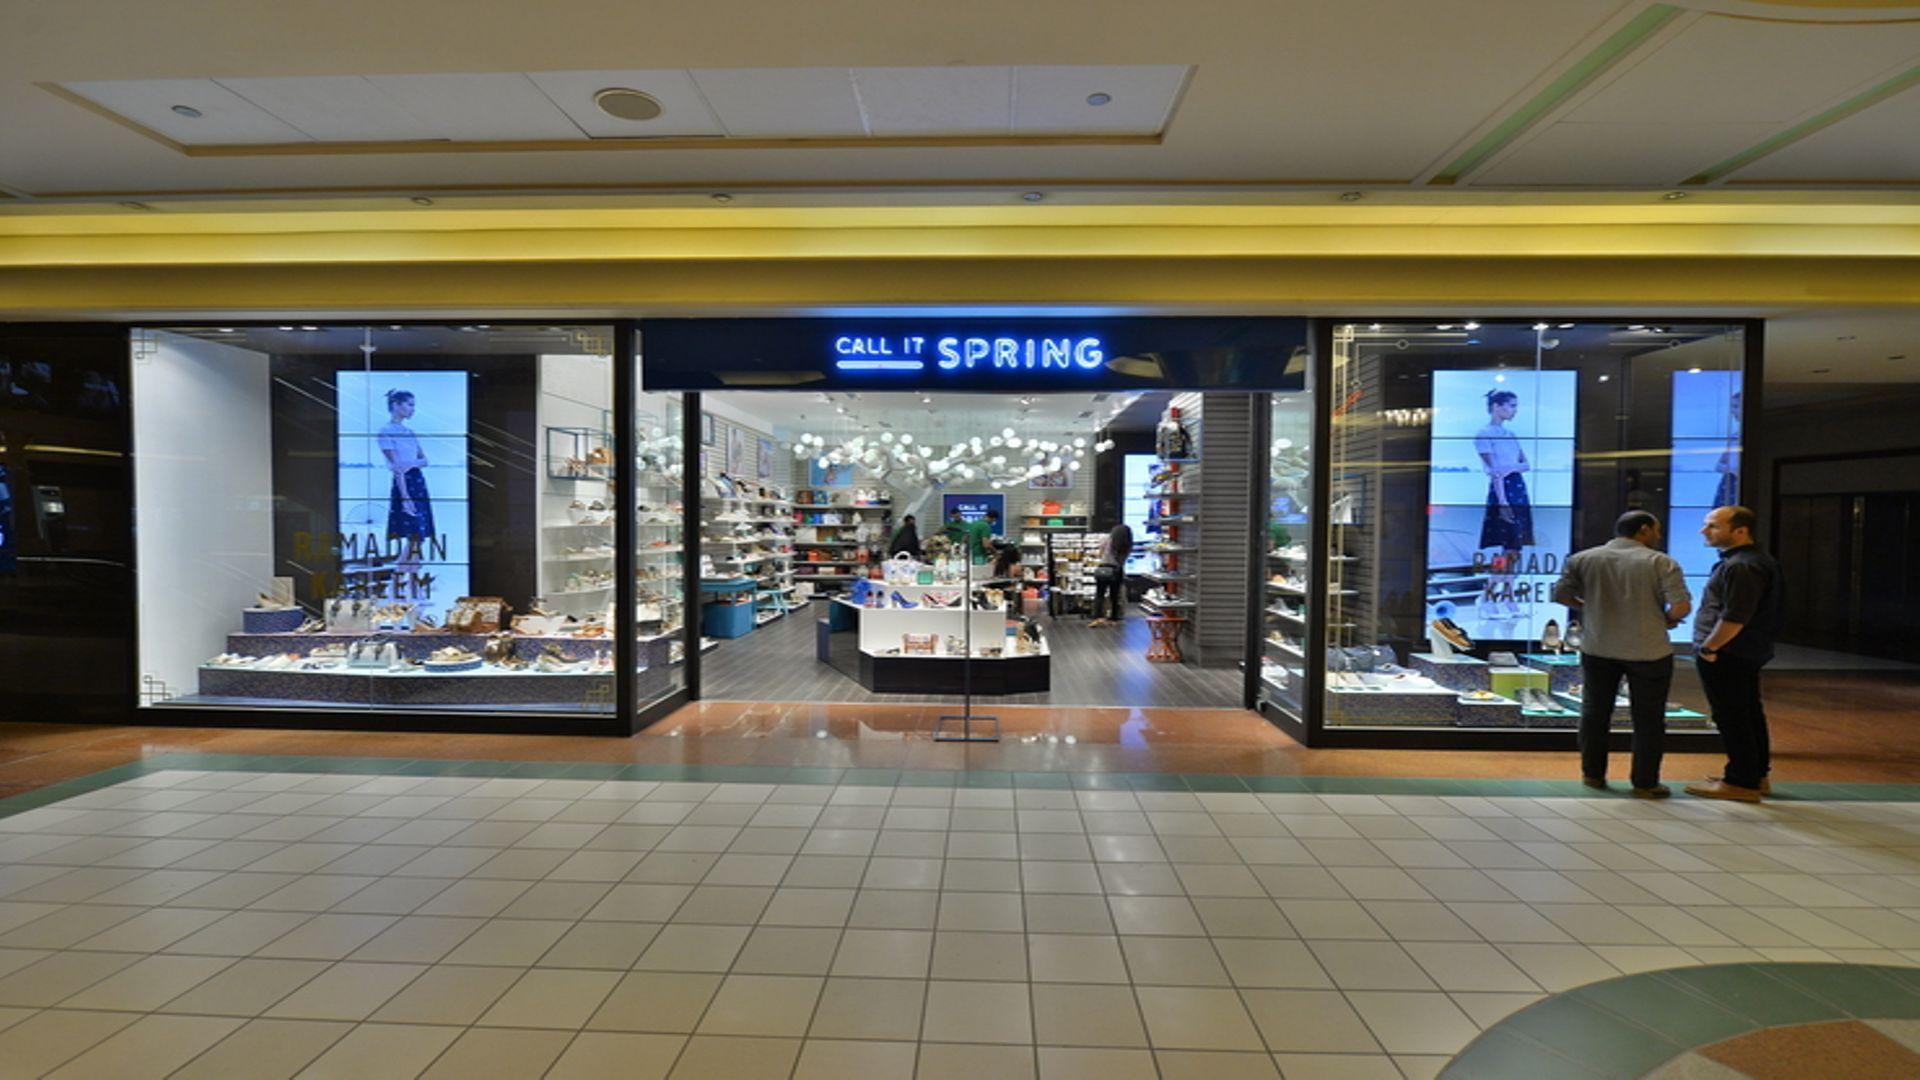 36b4b1e5a273 Citystars Shopping Mall. Over 750 luxurious stores.